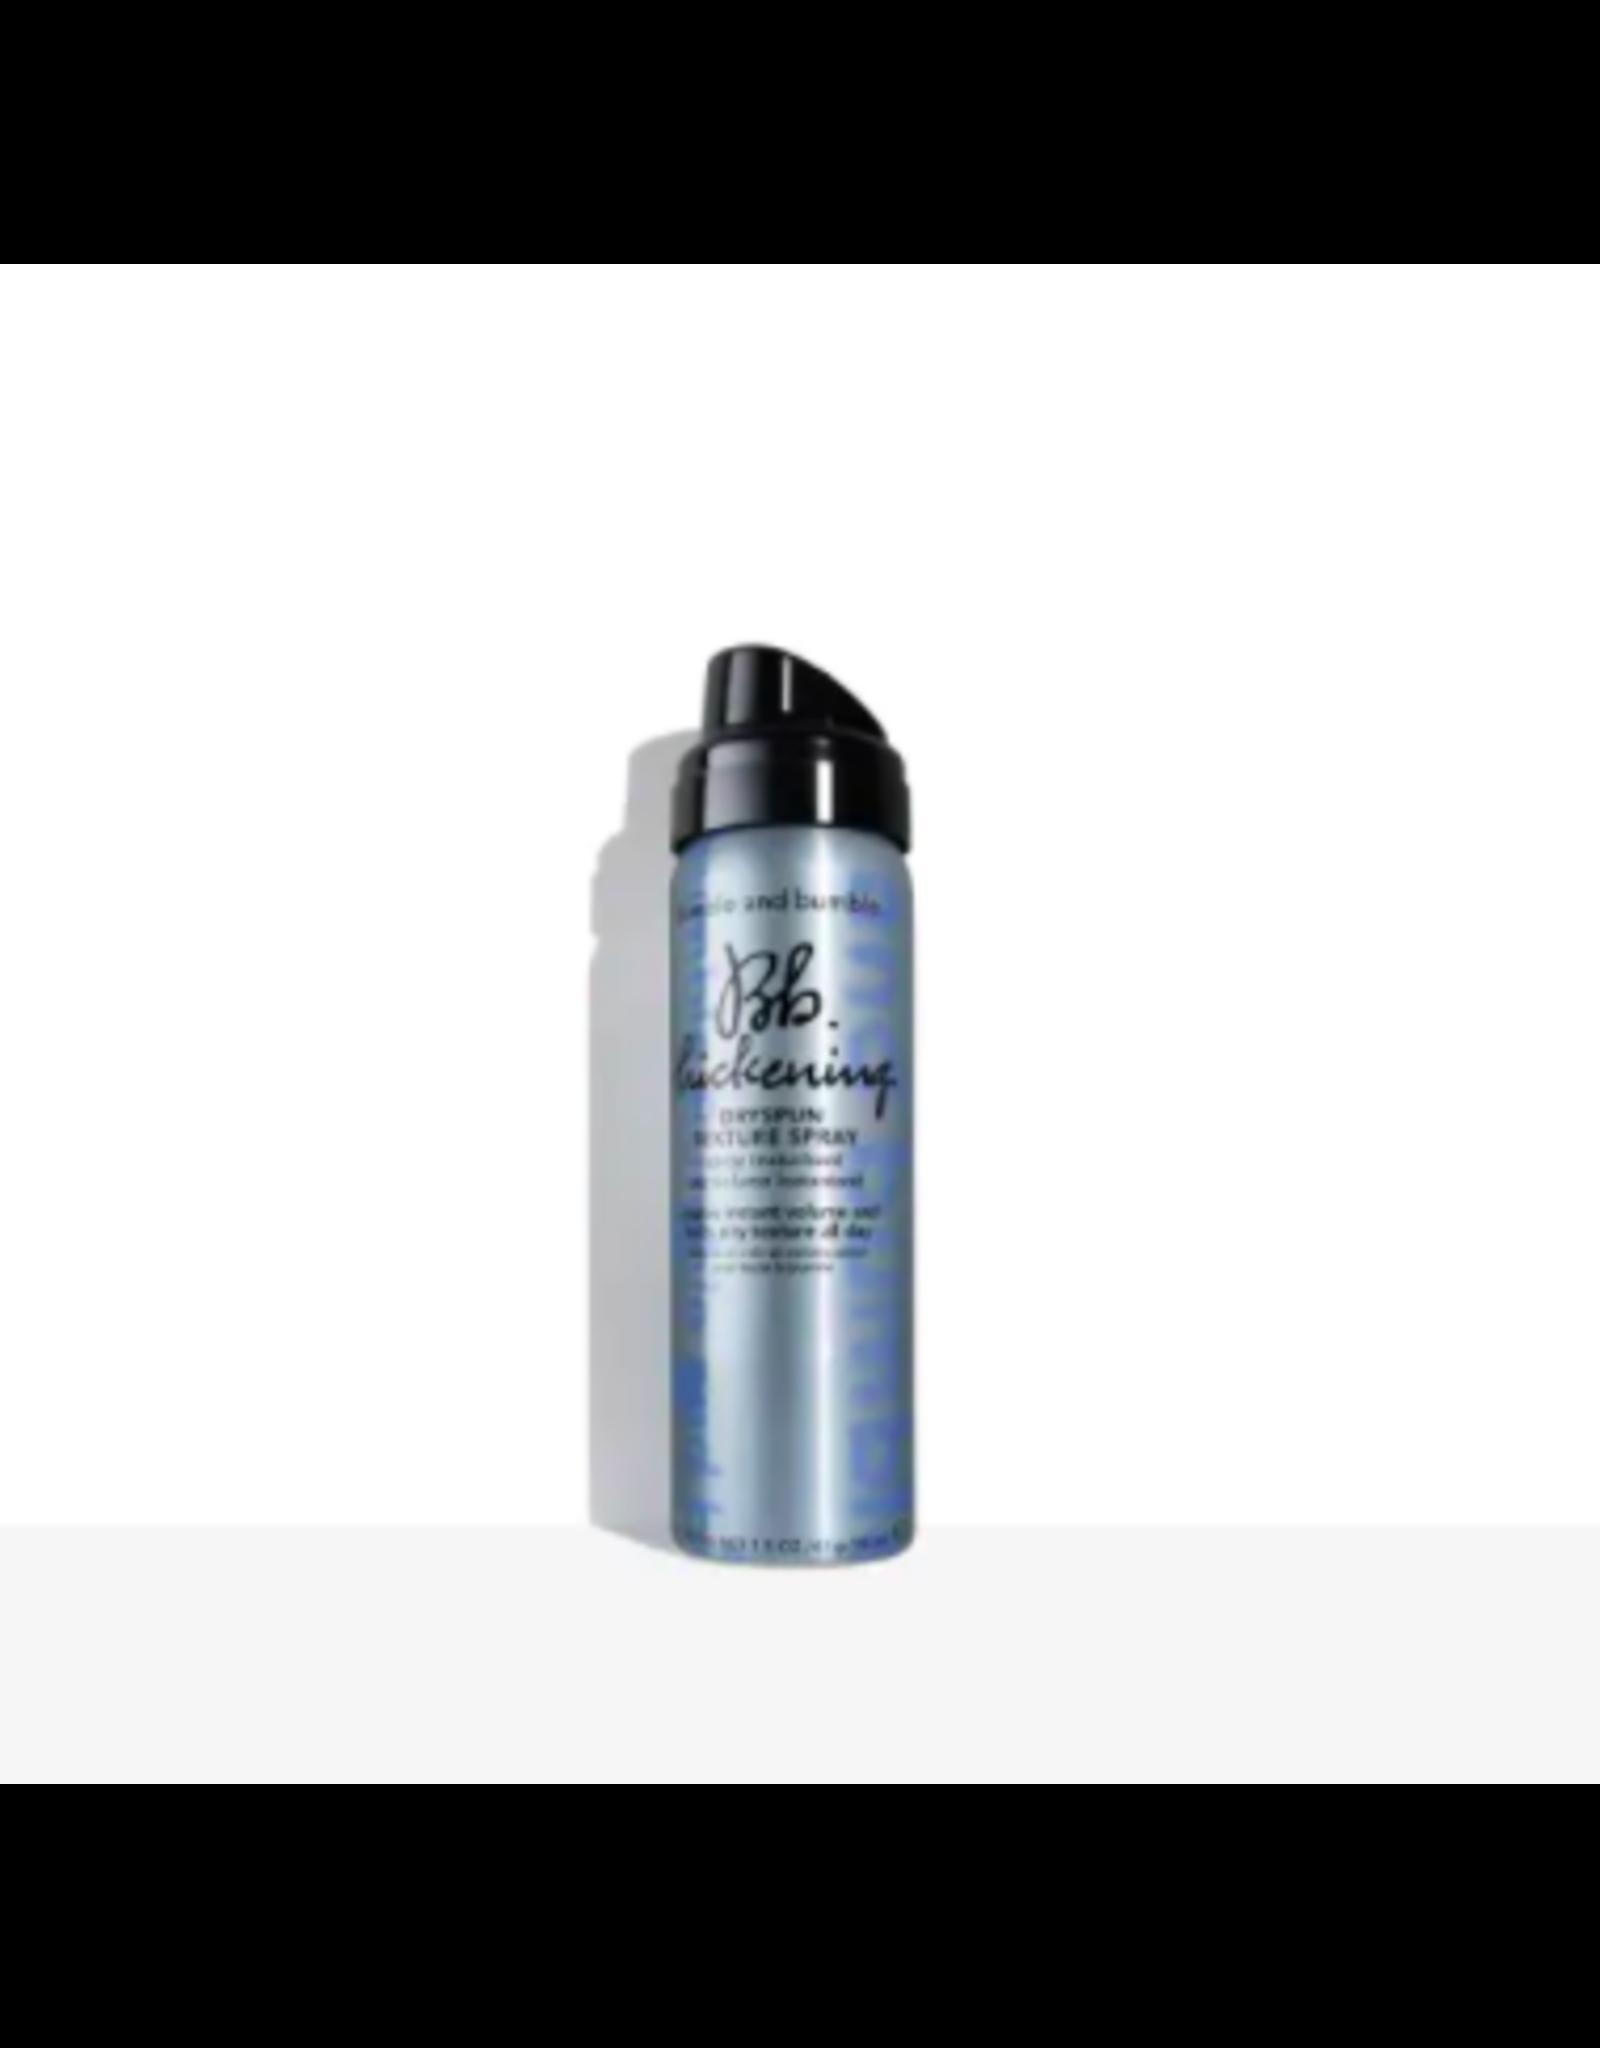 Bumble and bumble Thickening Dryspun Texture Spray 1.5 oz